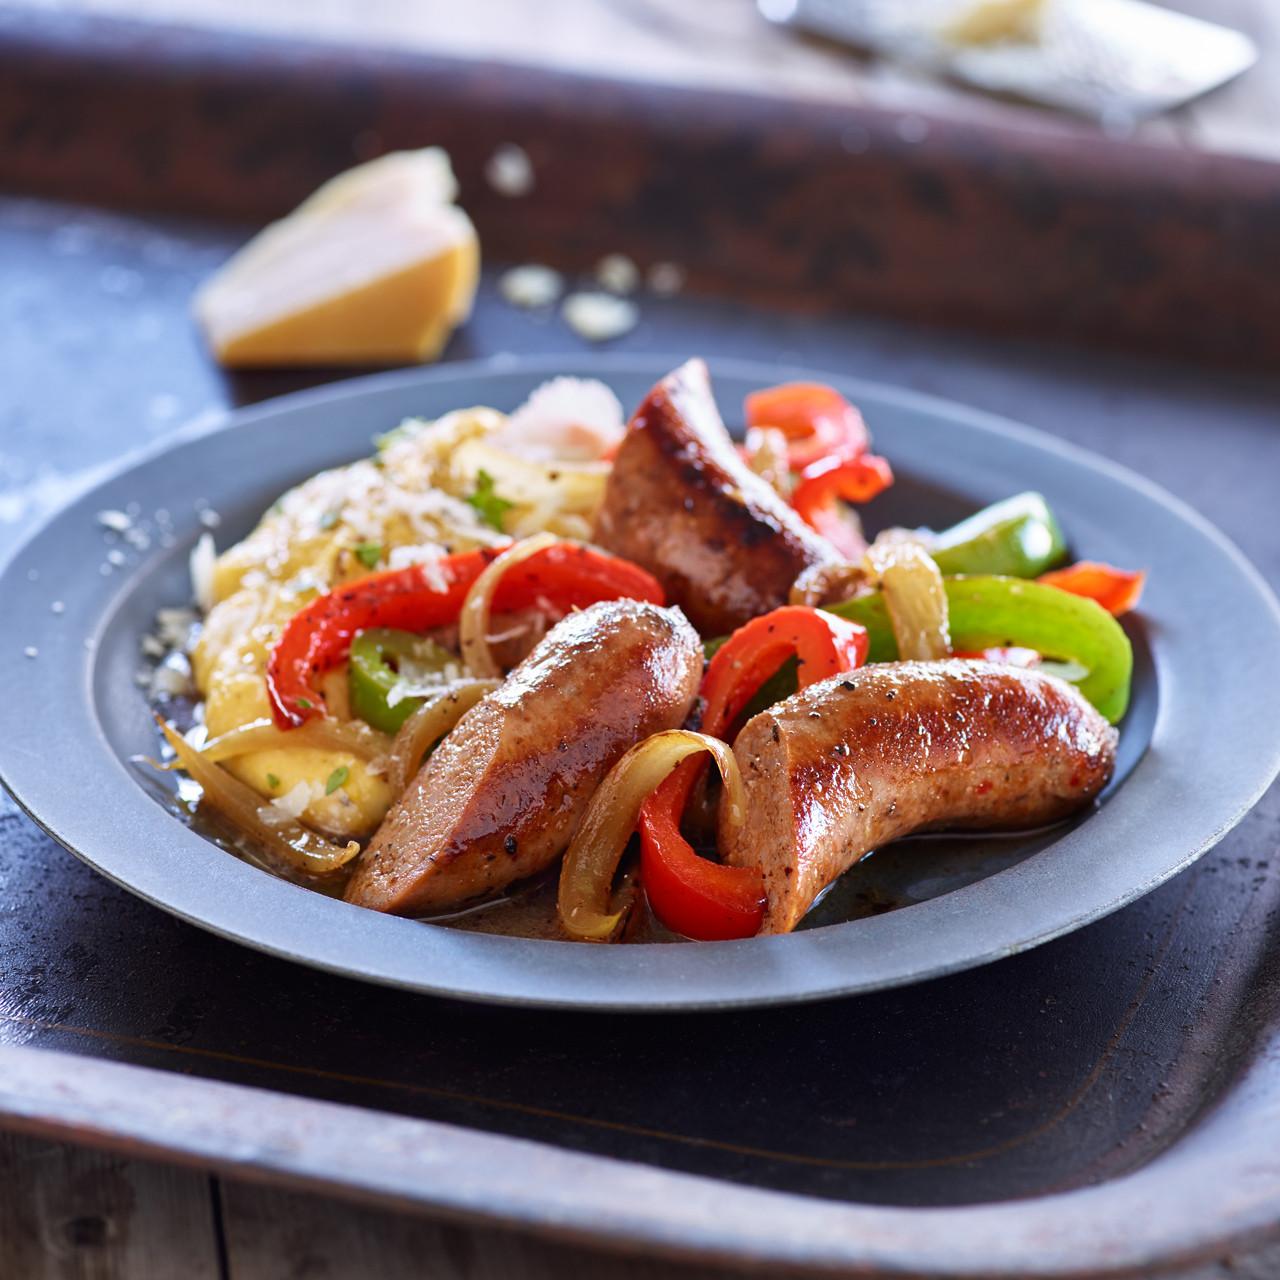 Turkey Sausage Recipes  Turkey Sausage Peppers & ions With Cream Polenta Shady